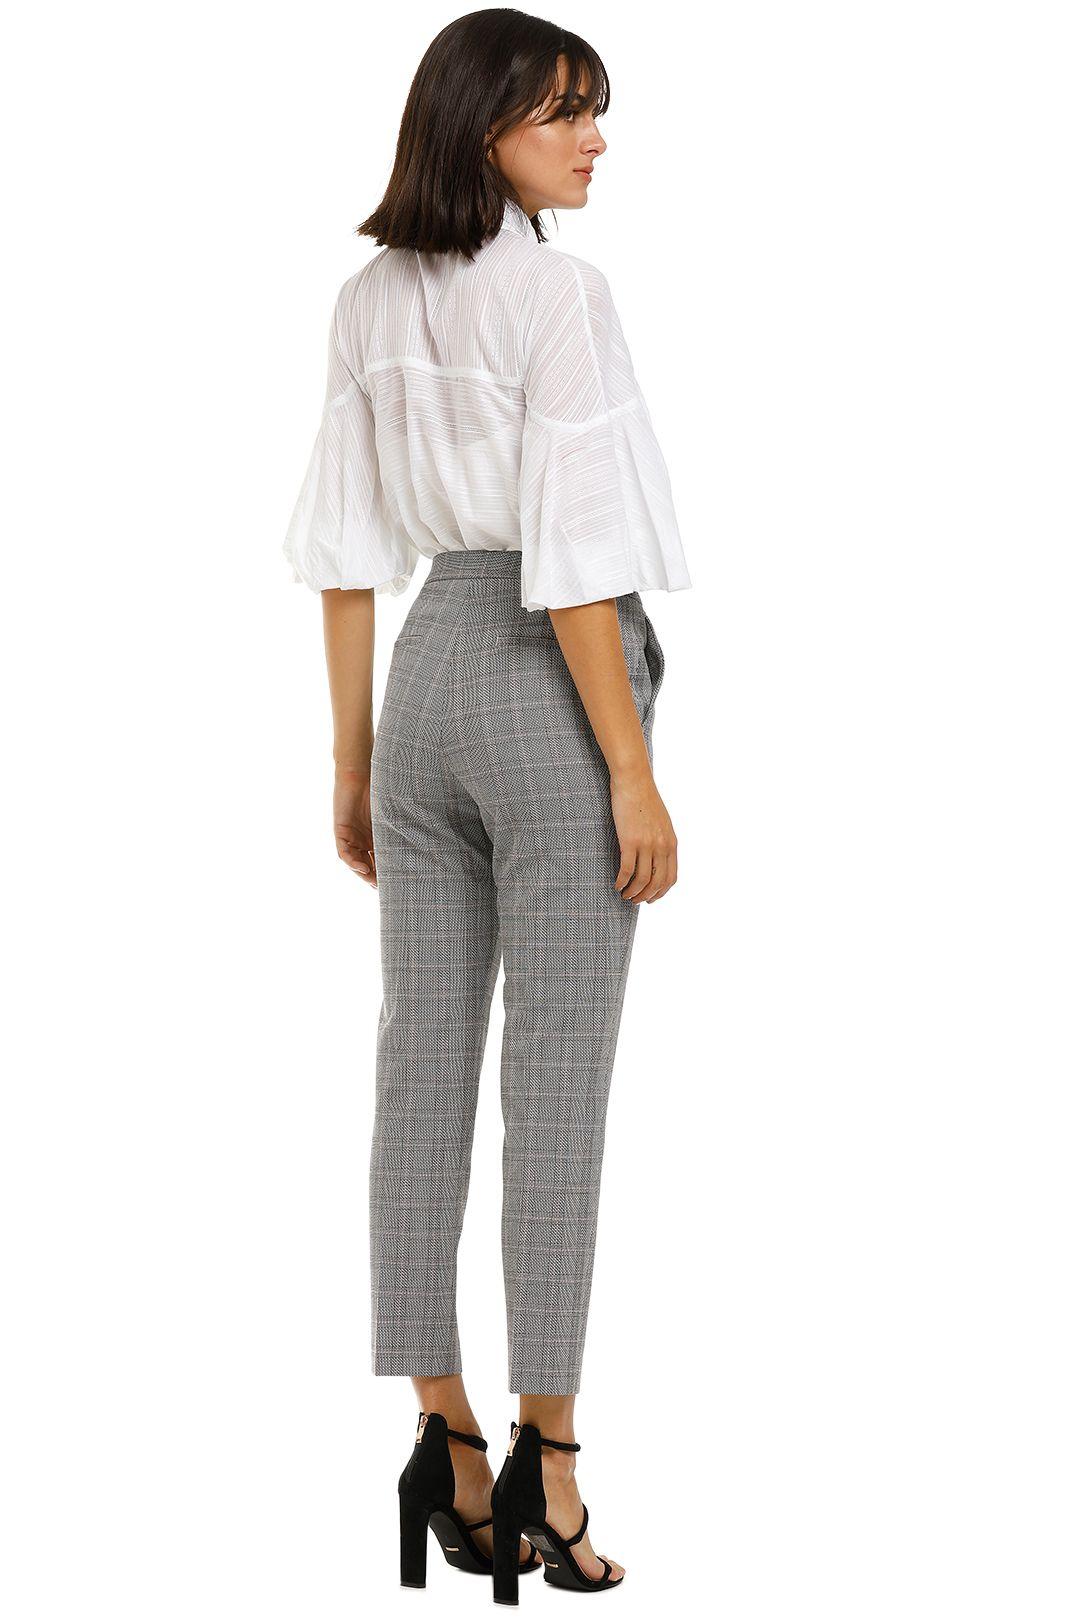 Rebecca-Margot-Slim-Pant-Grey-Check-Back